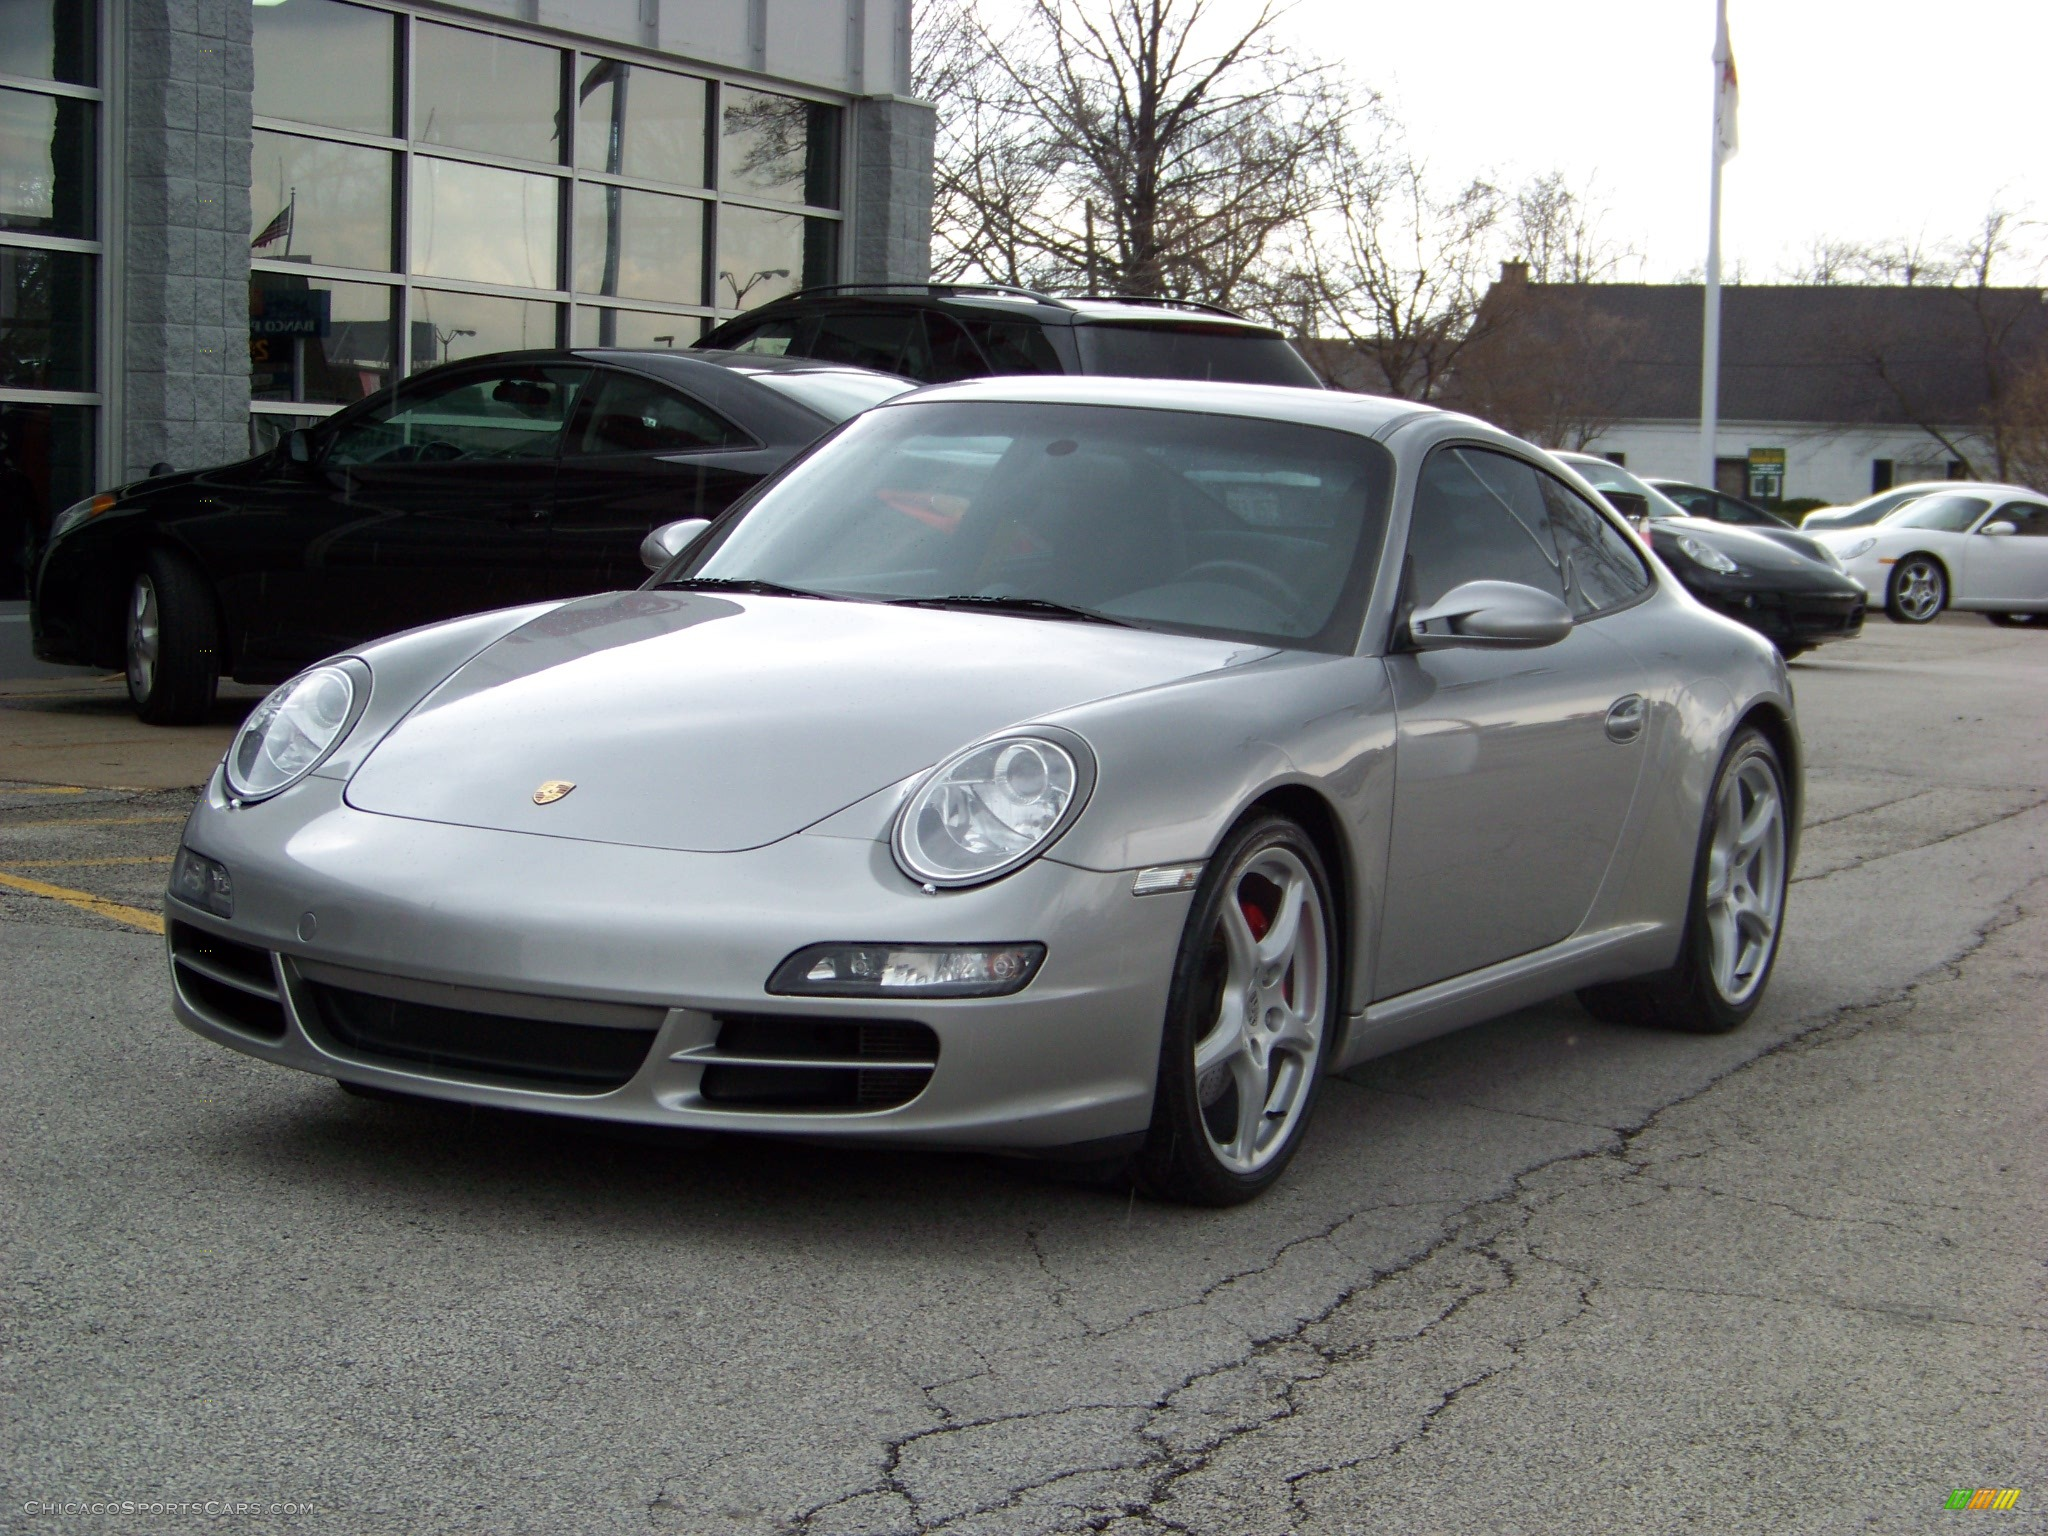 2005 porsche 911 carrera s coupe in gt silver metallic 741652 cars. Black Bedroom Furniture Sets. Home Design Ideas